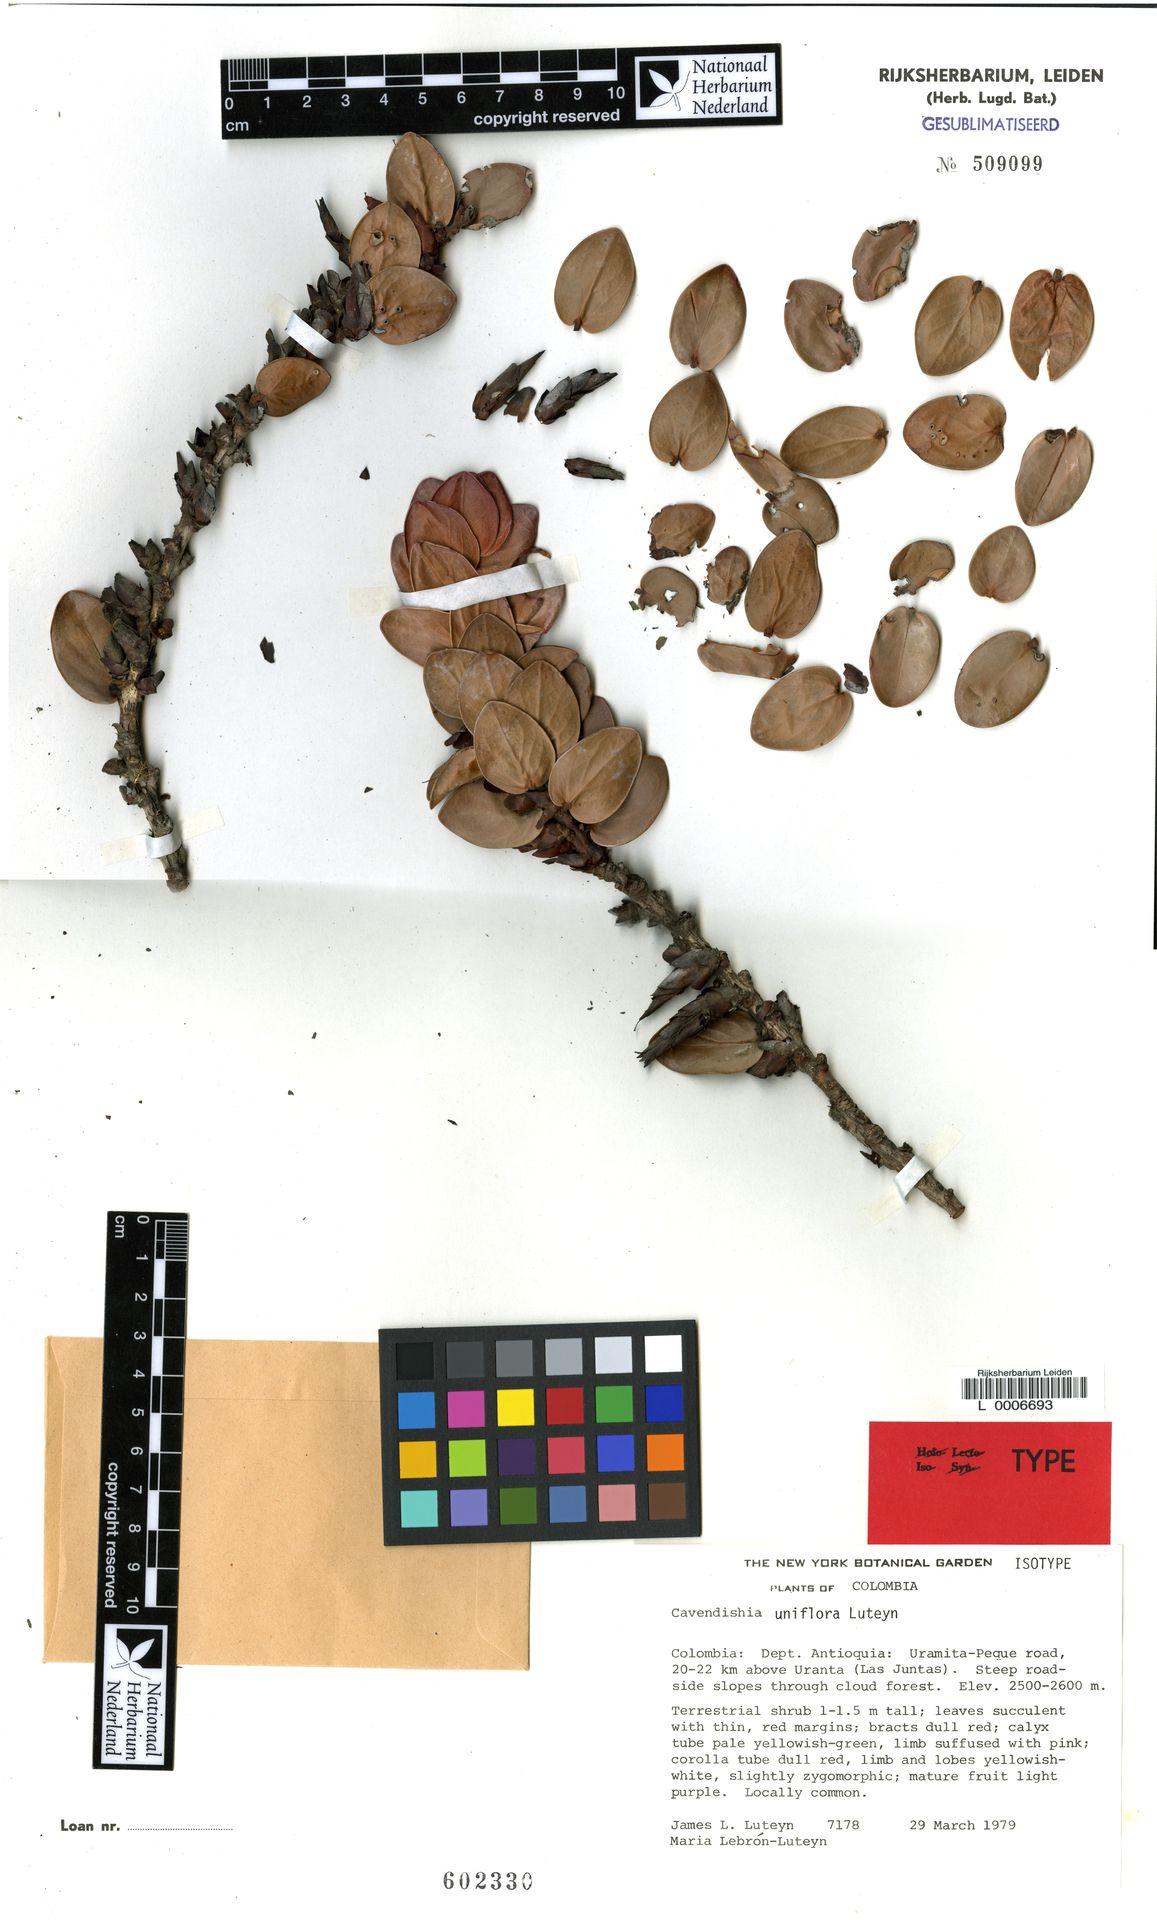 L  0006693 | Cavendishia uniflora Luteyn